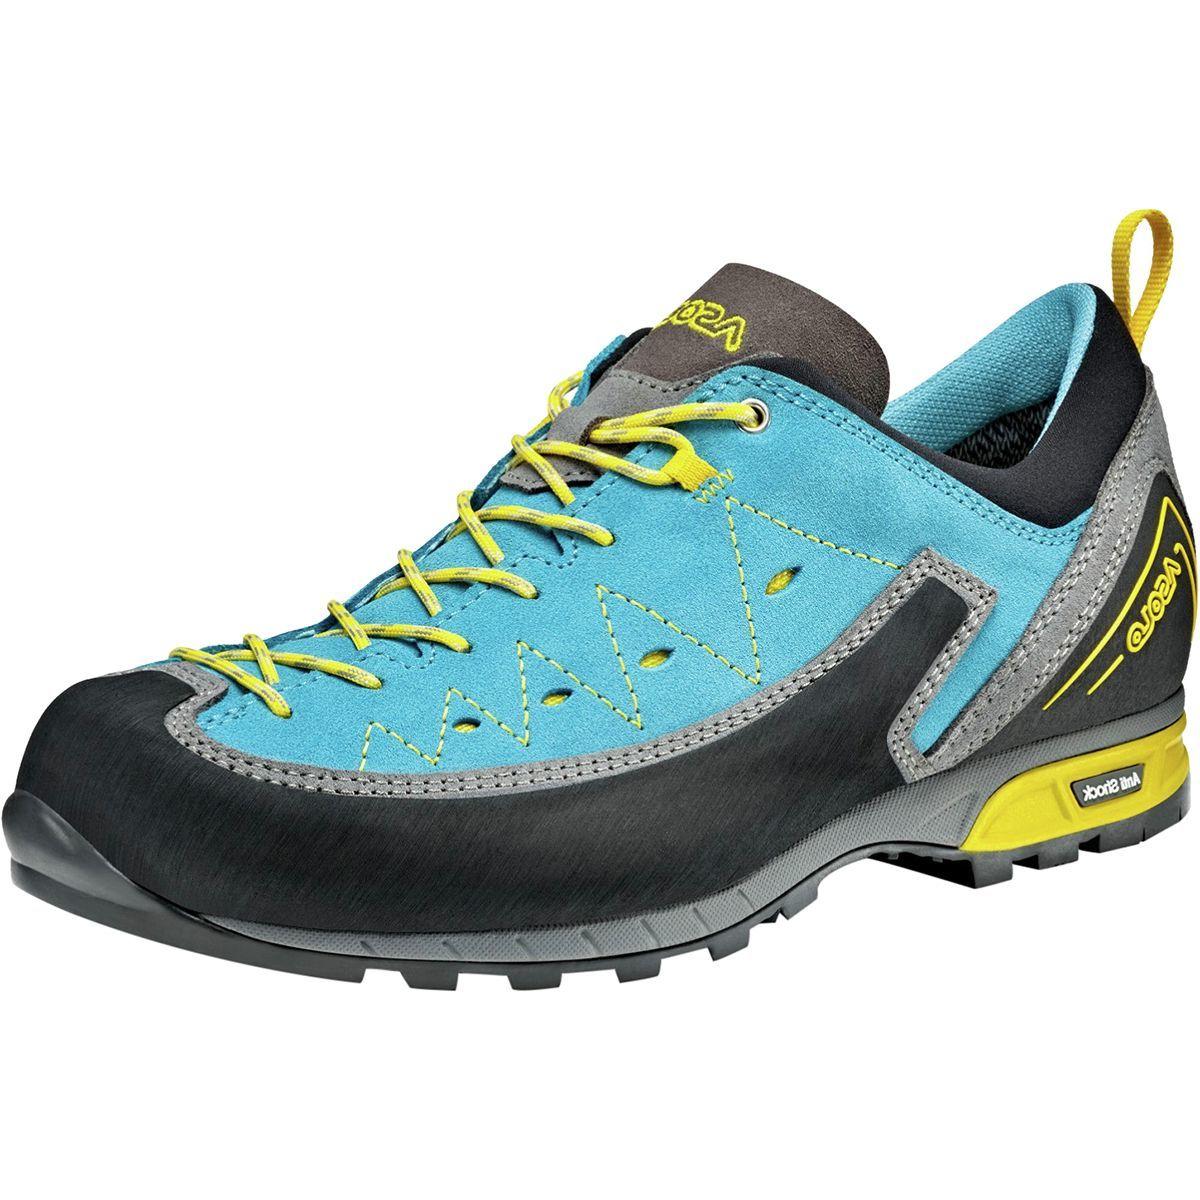 Asolo Apex Shoe - Women's